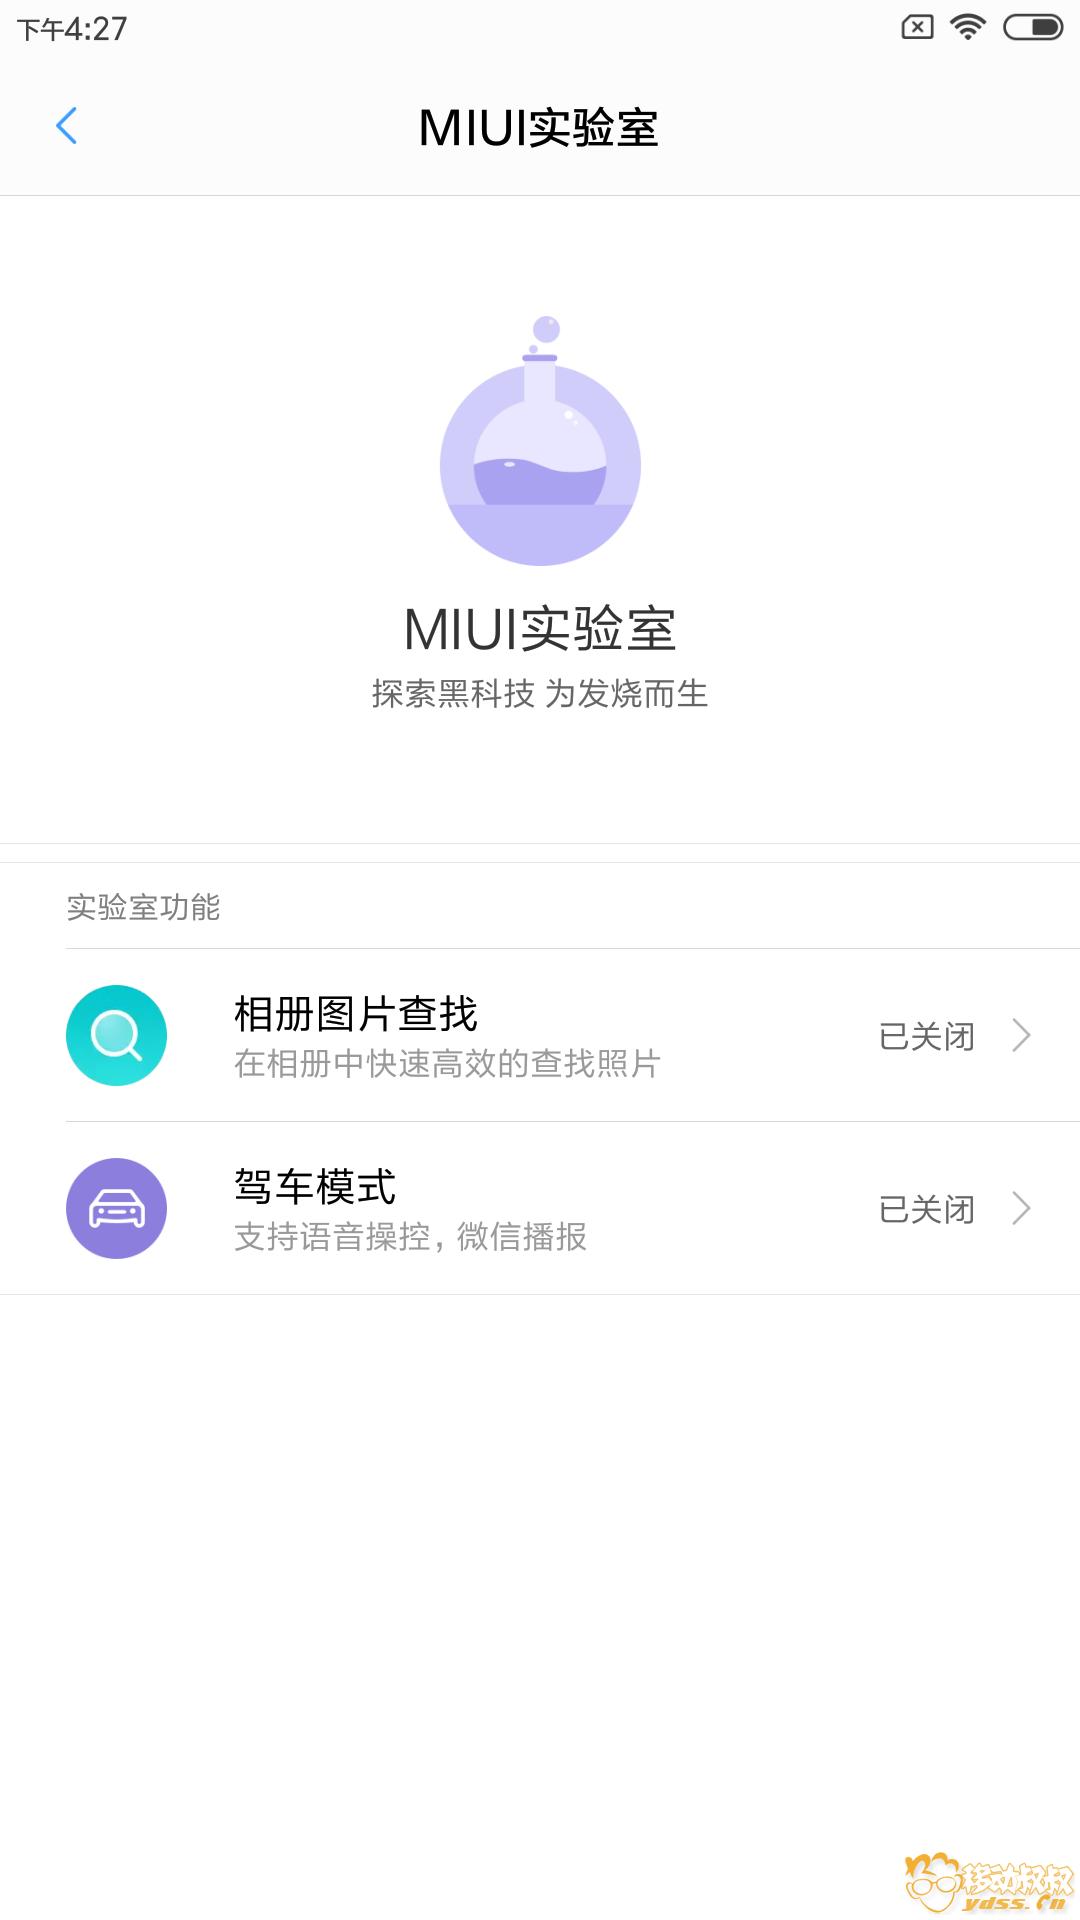 Screenshot_2018-07-11-16-27-23-892_com.android.settings.png